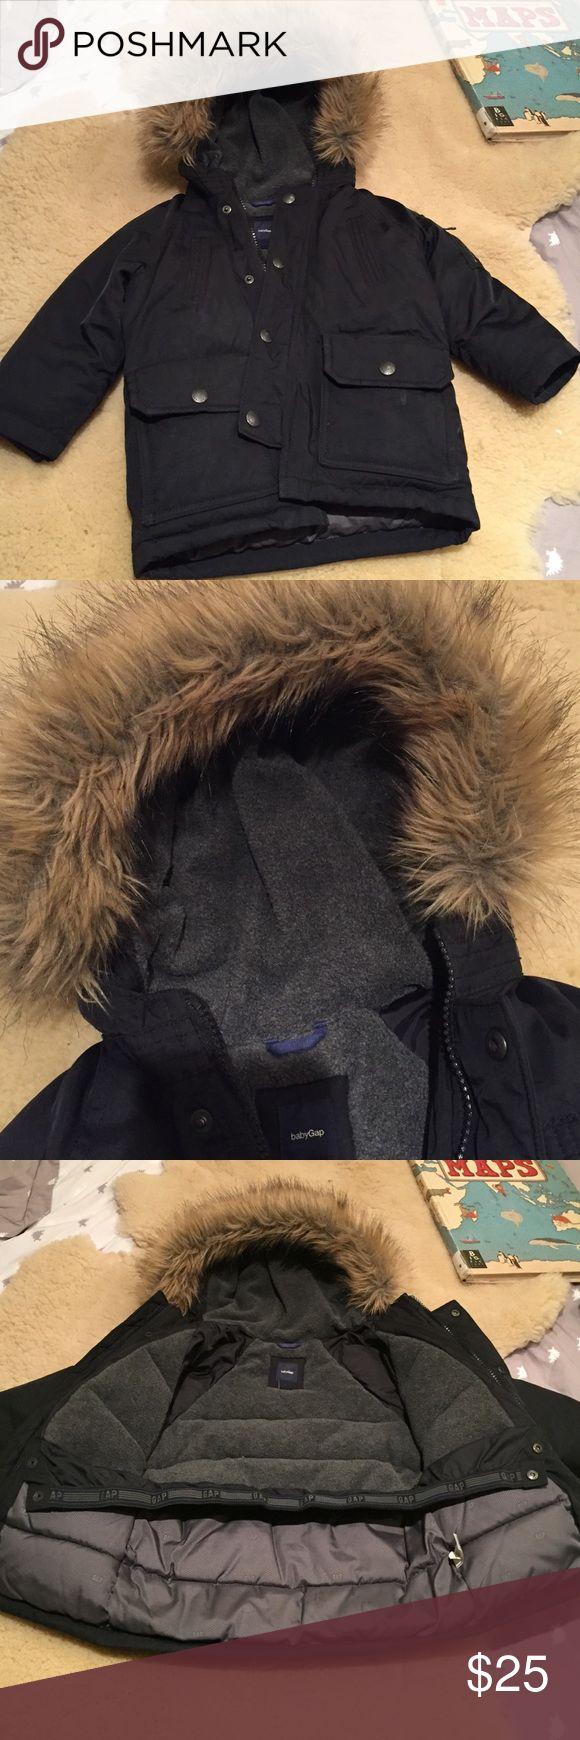 Baby Gap Coat Great hardly worn condition GAP Jackets & Coats Puffers